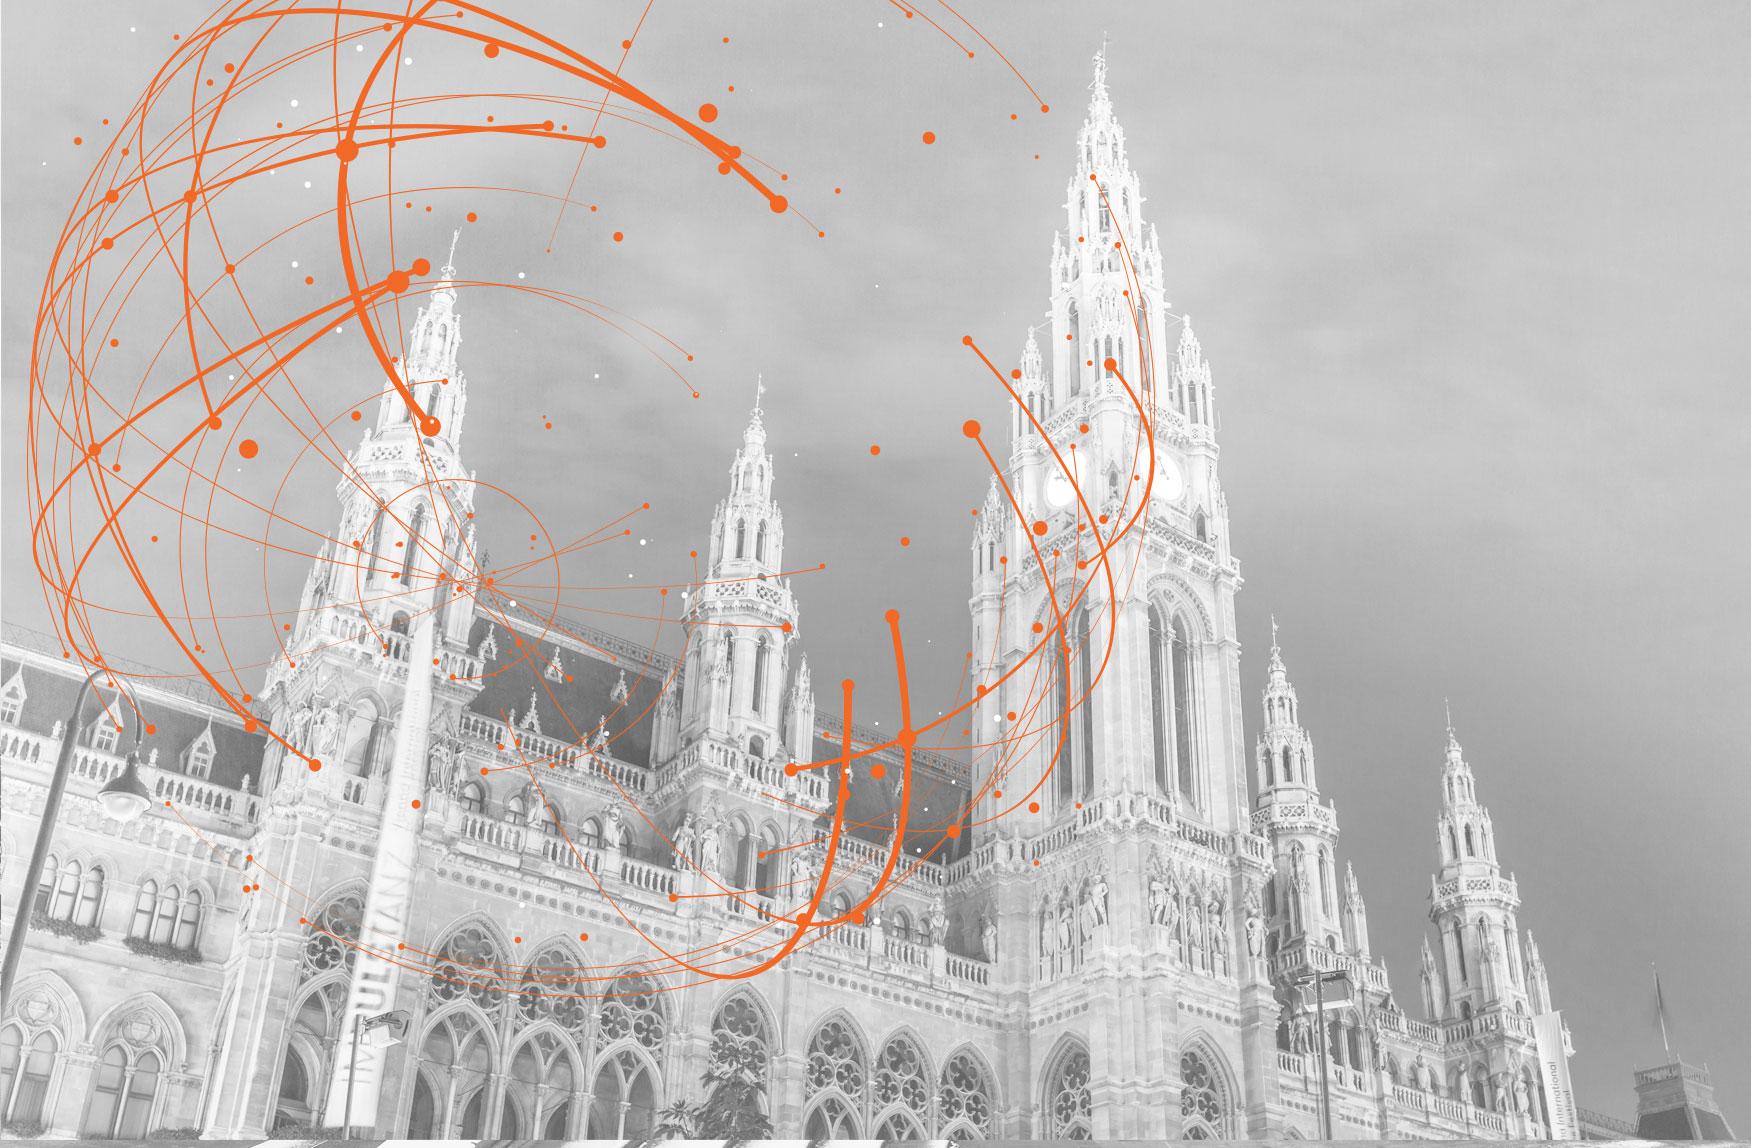 Vienna, City Hall, t'works company